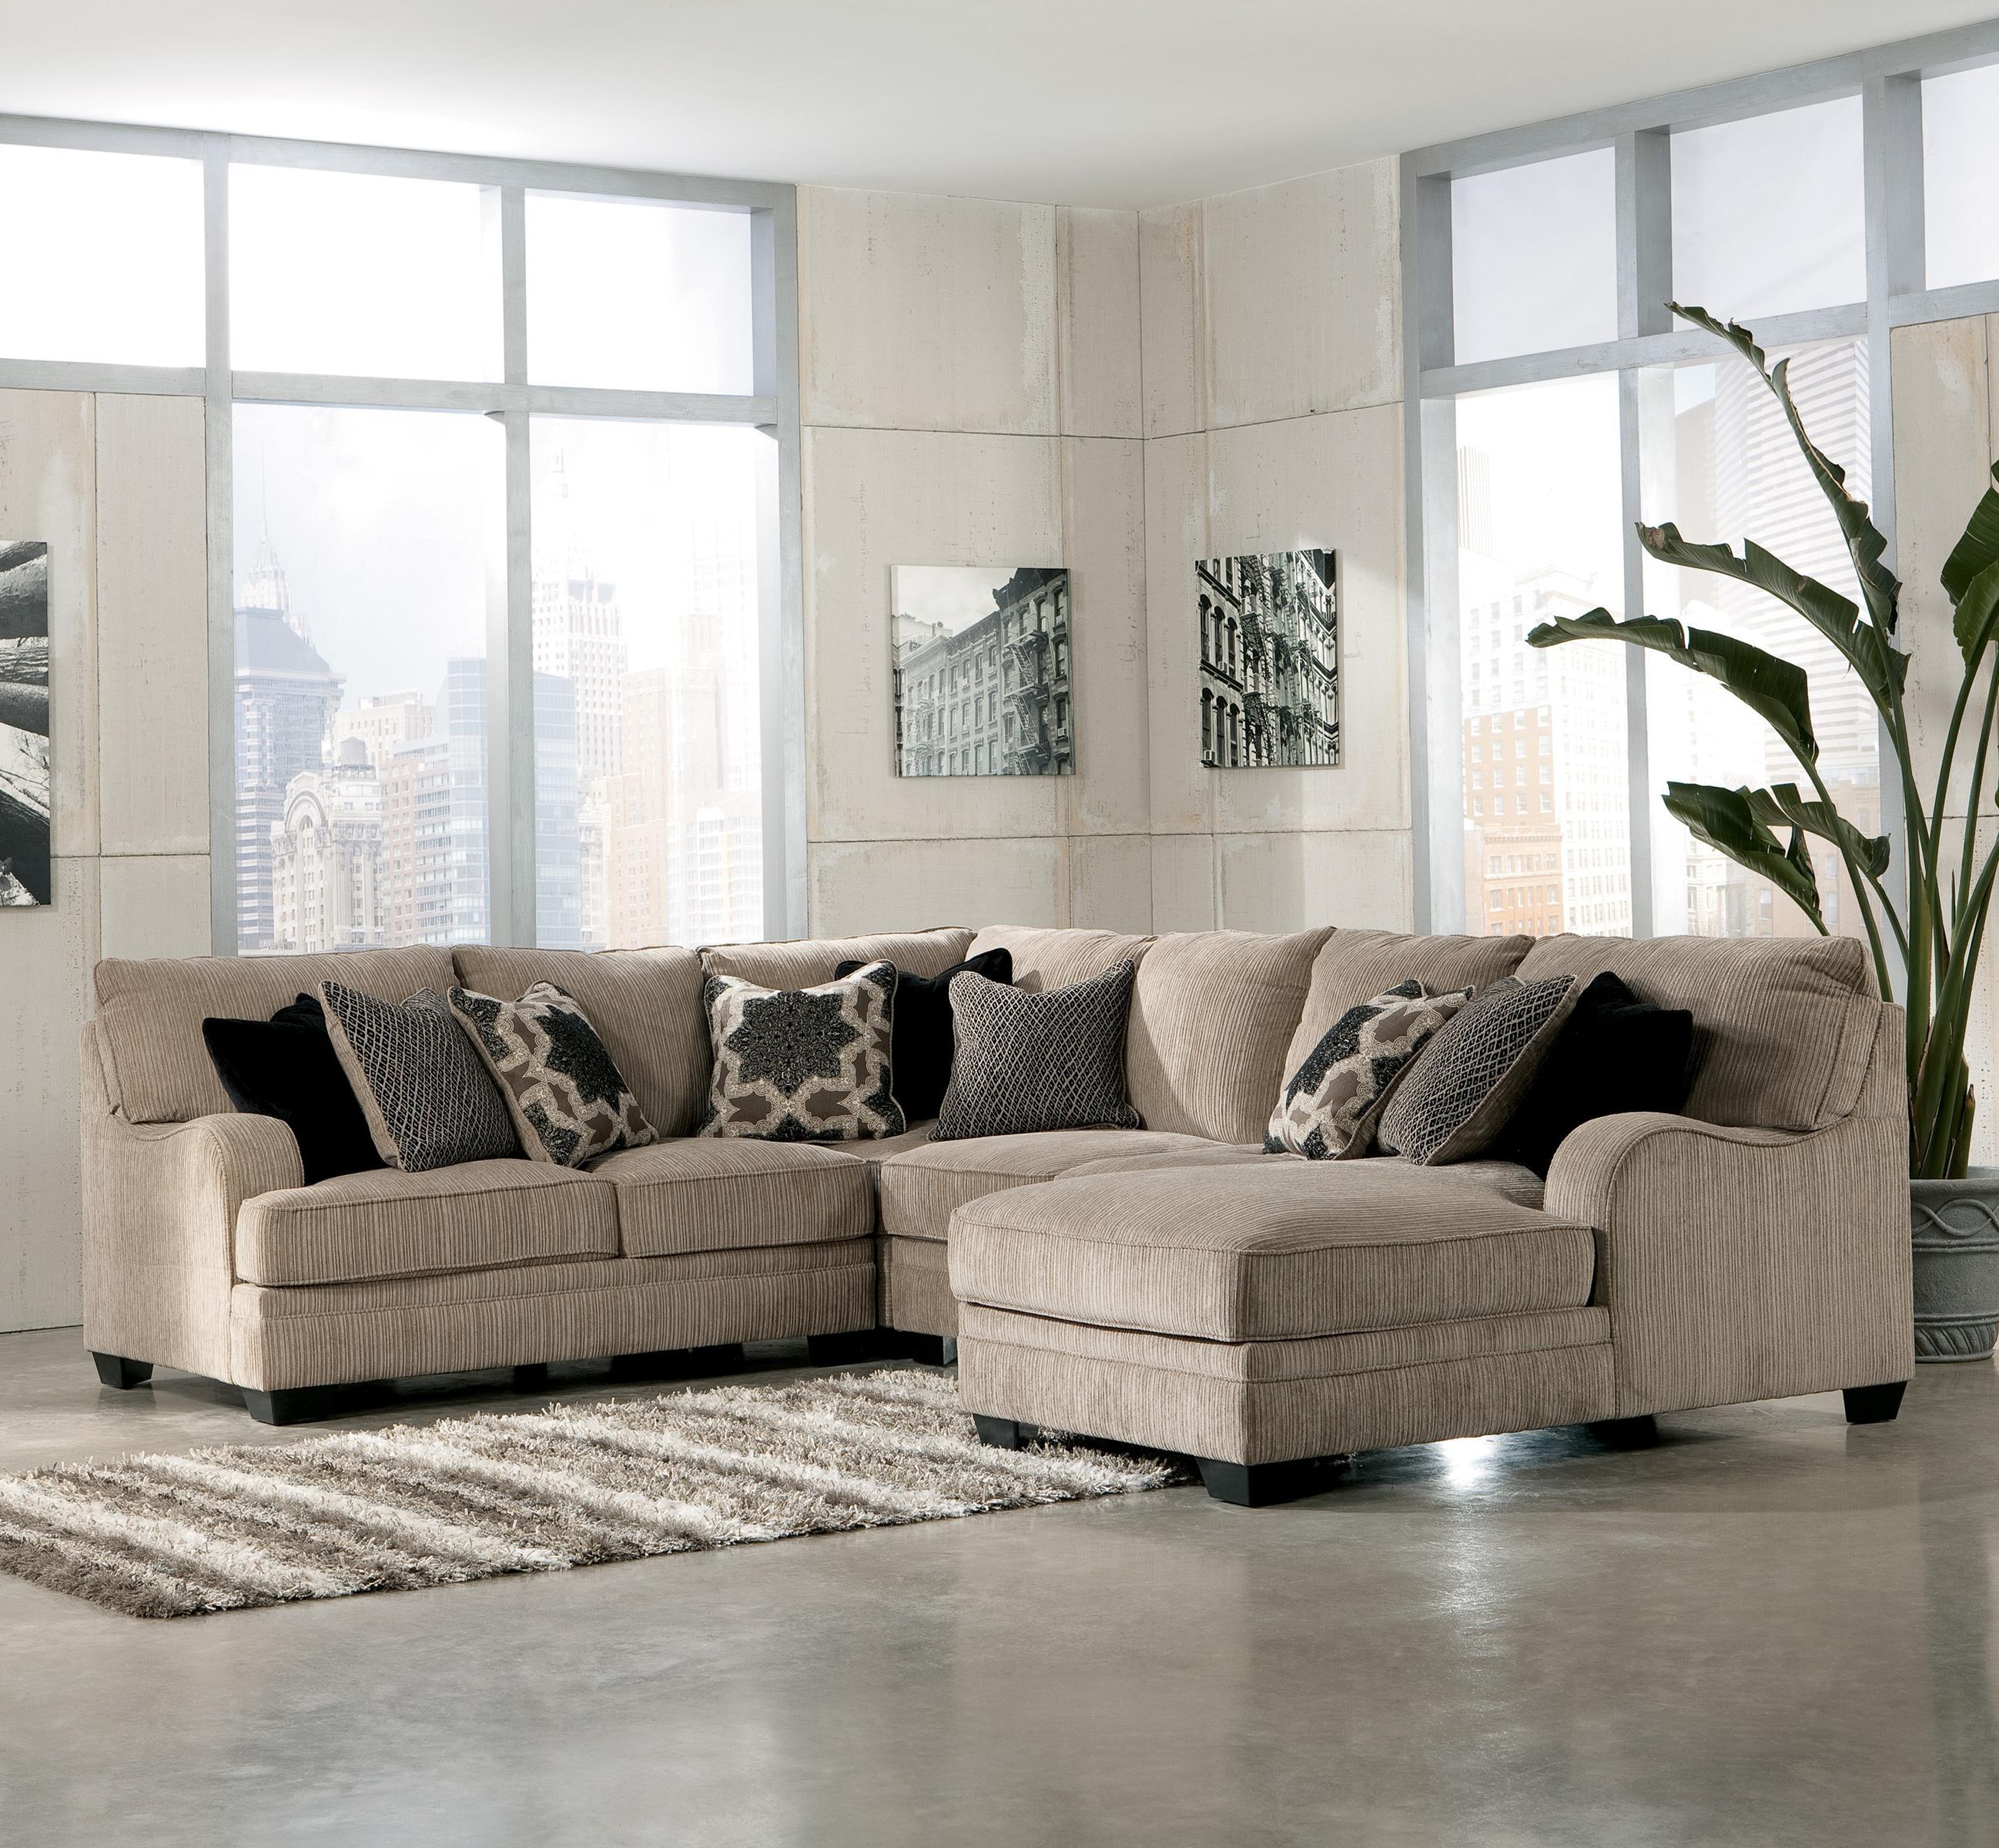 Signature Designashley Katisha - Platinum 4-Piece Sectional Sofa in Peterborough Ontario Sectional Sofas (Image 7 of 10)